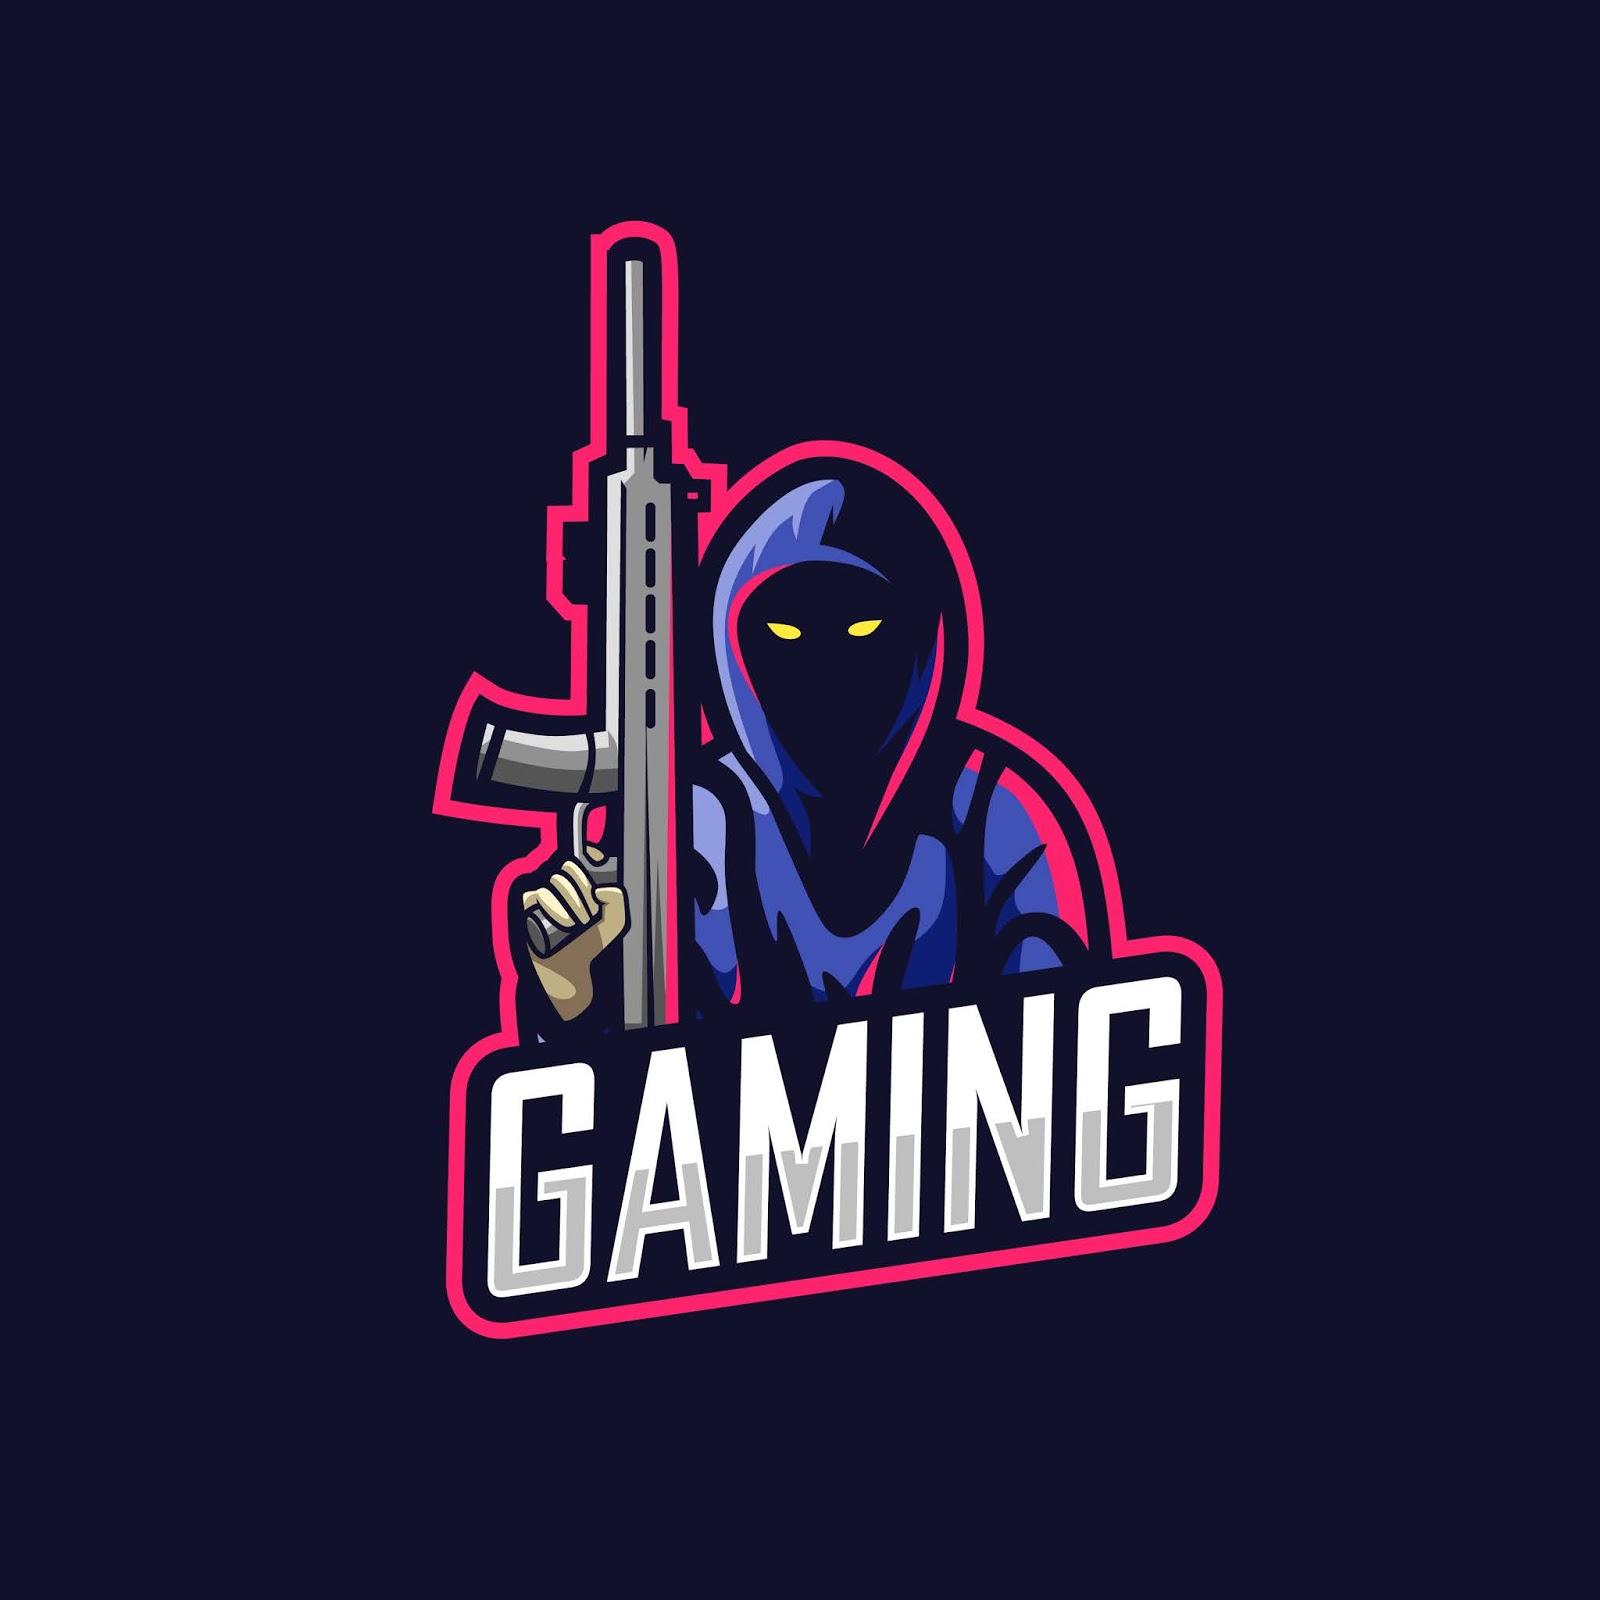 Killer Man Gaming Logo Free Download Vector CDR, AI, EPS and PNG Formats